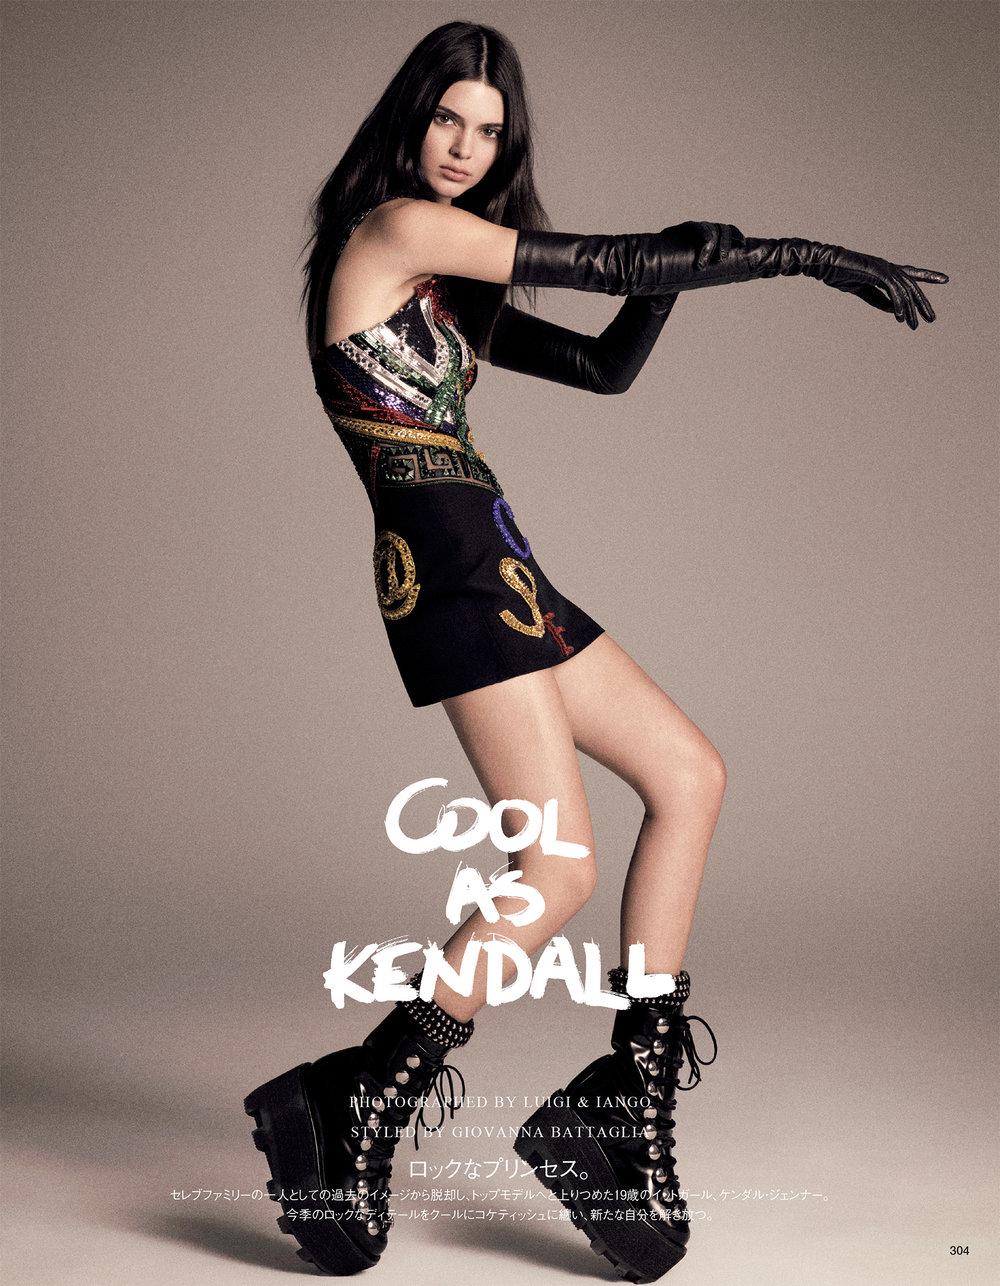 Giovanna-Battaglia-Vogue-Japan-November-2015-Cool-As-Kendall-Patrick-Demarchelier-Kendall-Jenner-1.jpg